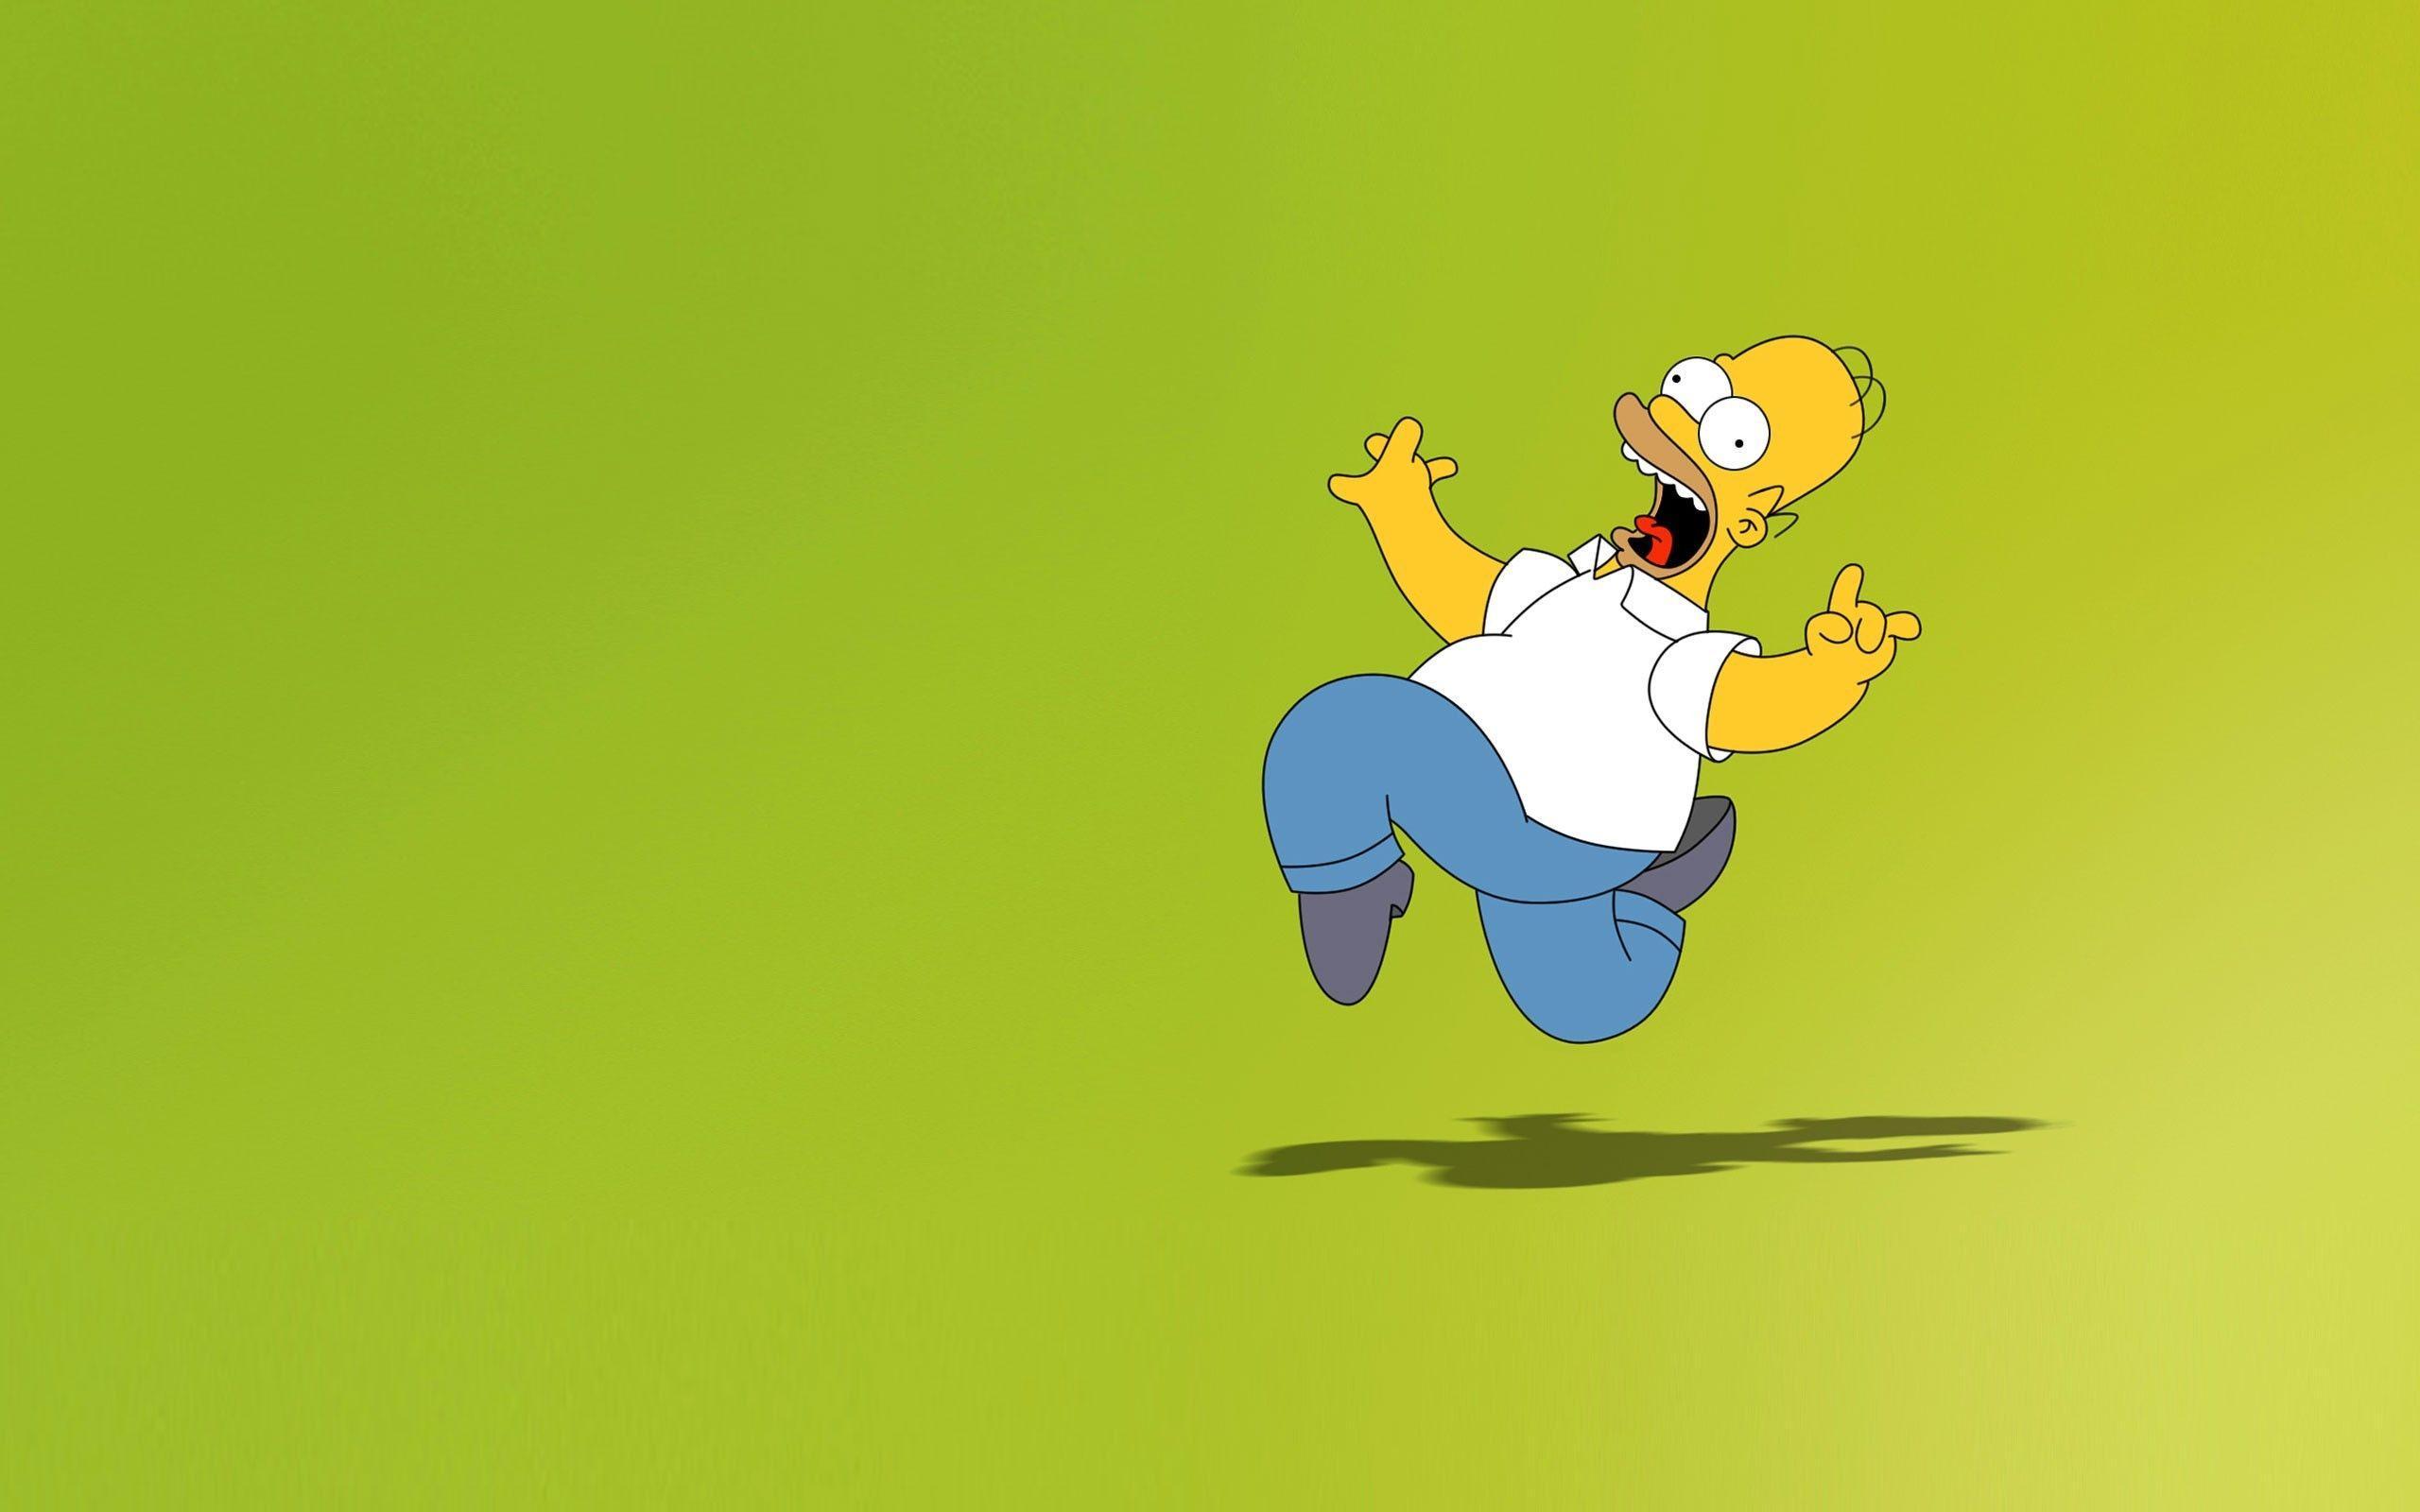 Bart Simpson HD Wallpapers Backgrounds Wallpaper